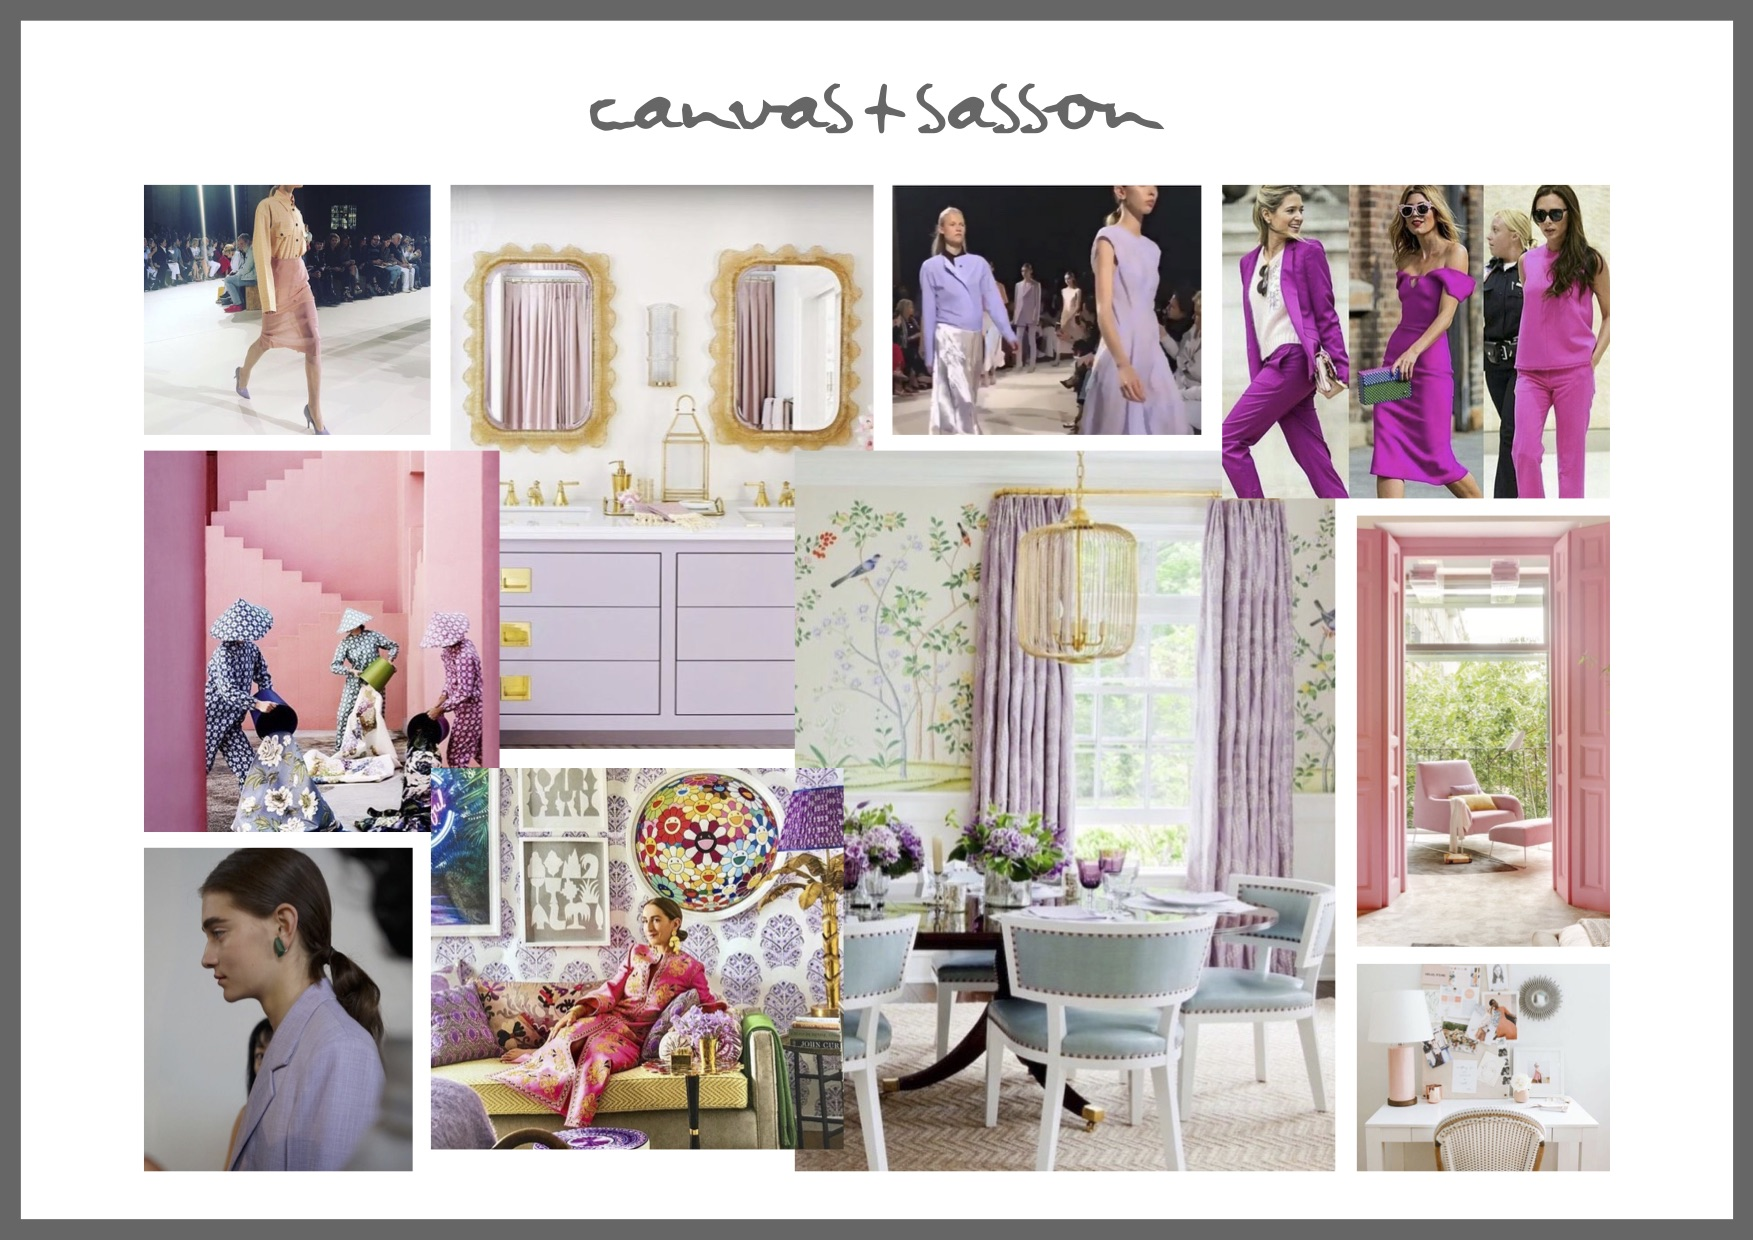 Canvas + Sasson Mood Board September 2017.jpg